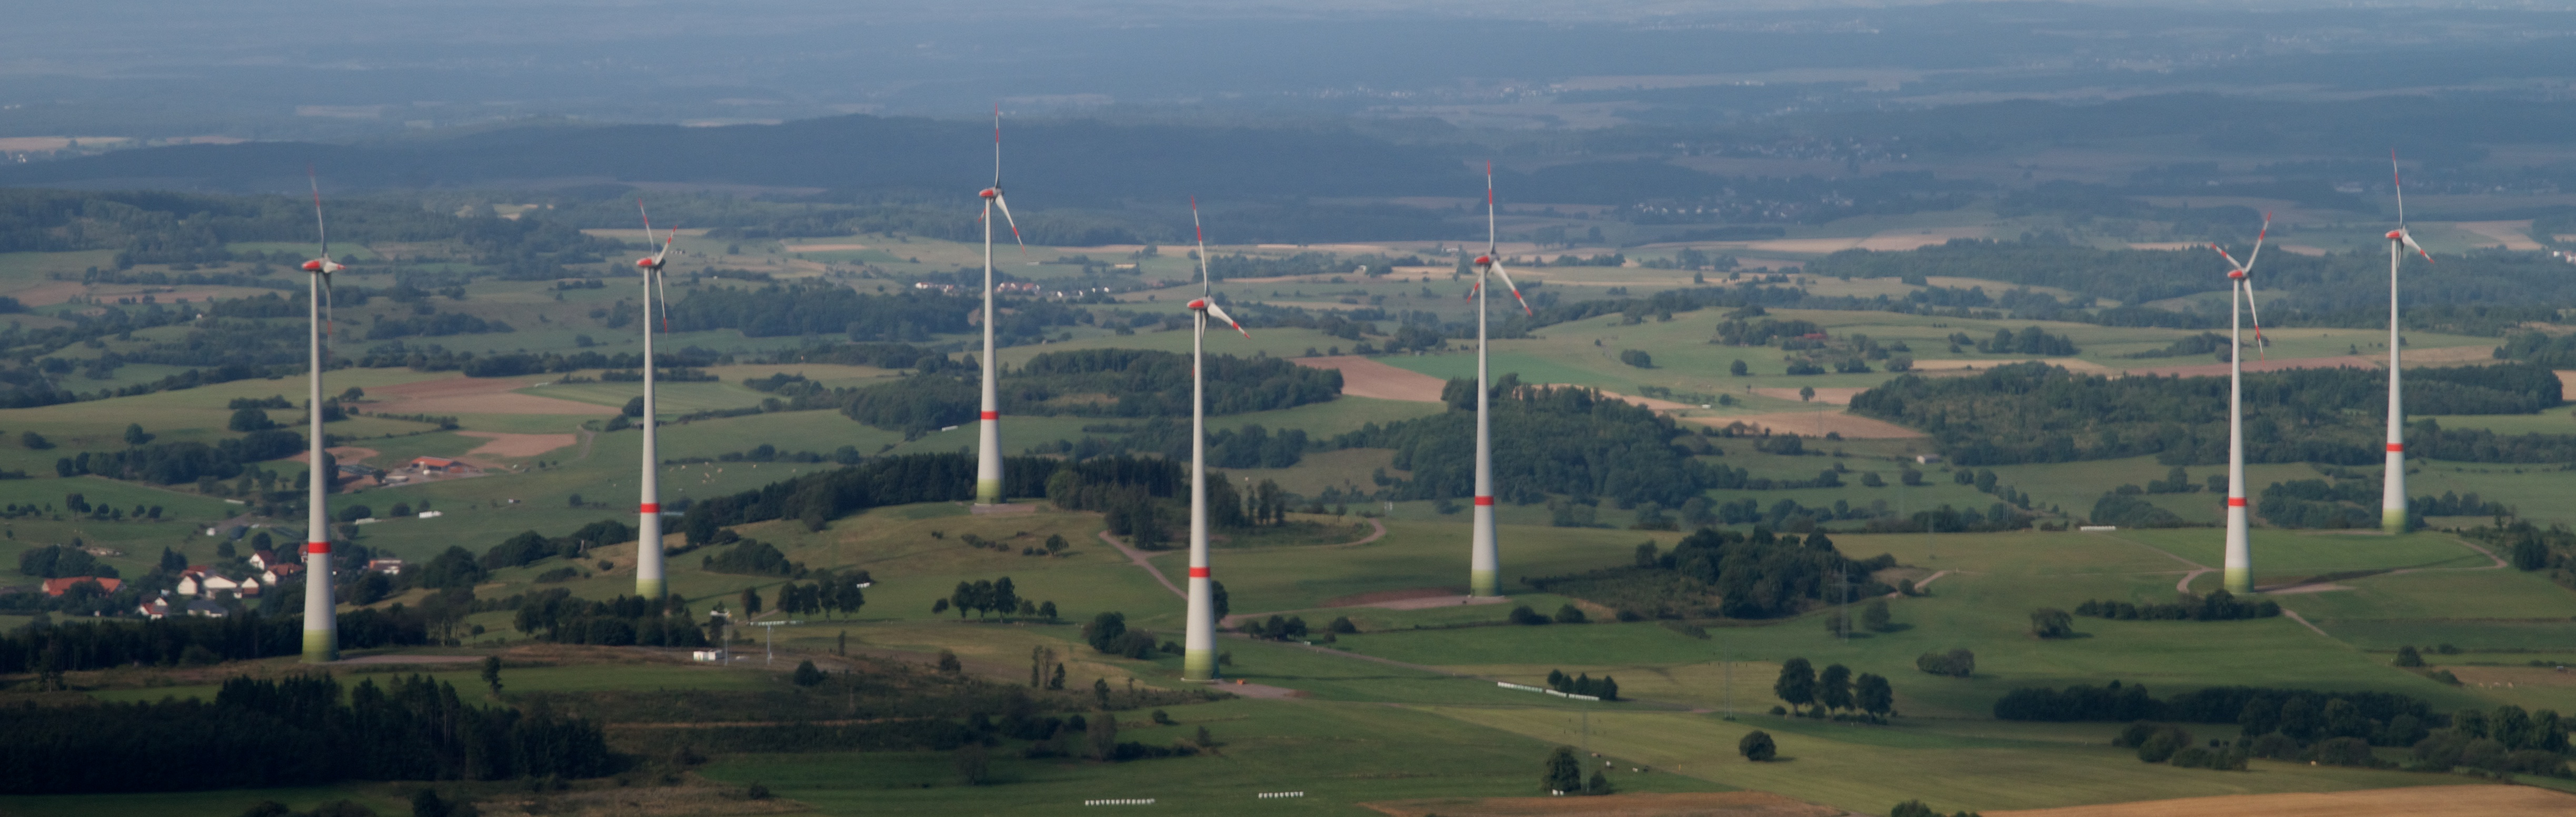 Platte: Windkraft im Vogelsberg